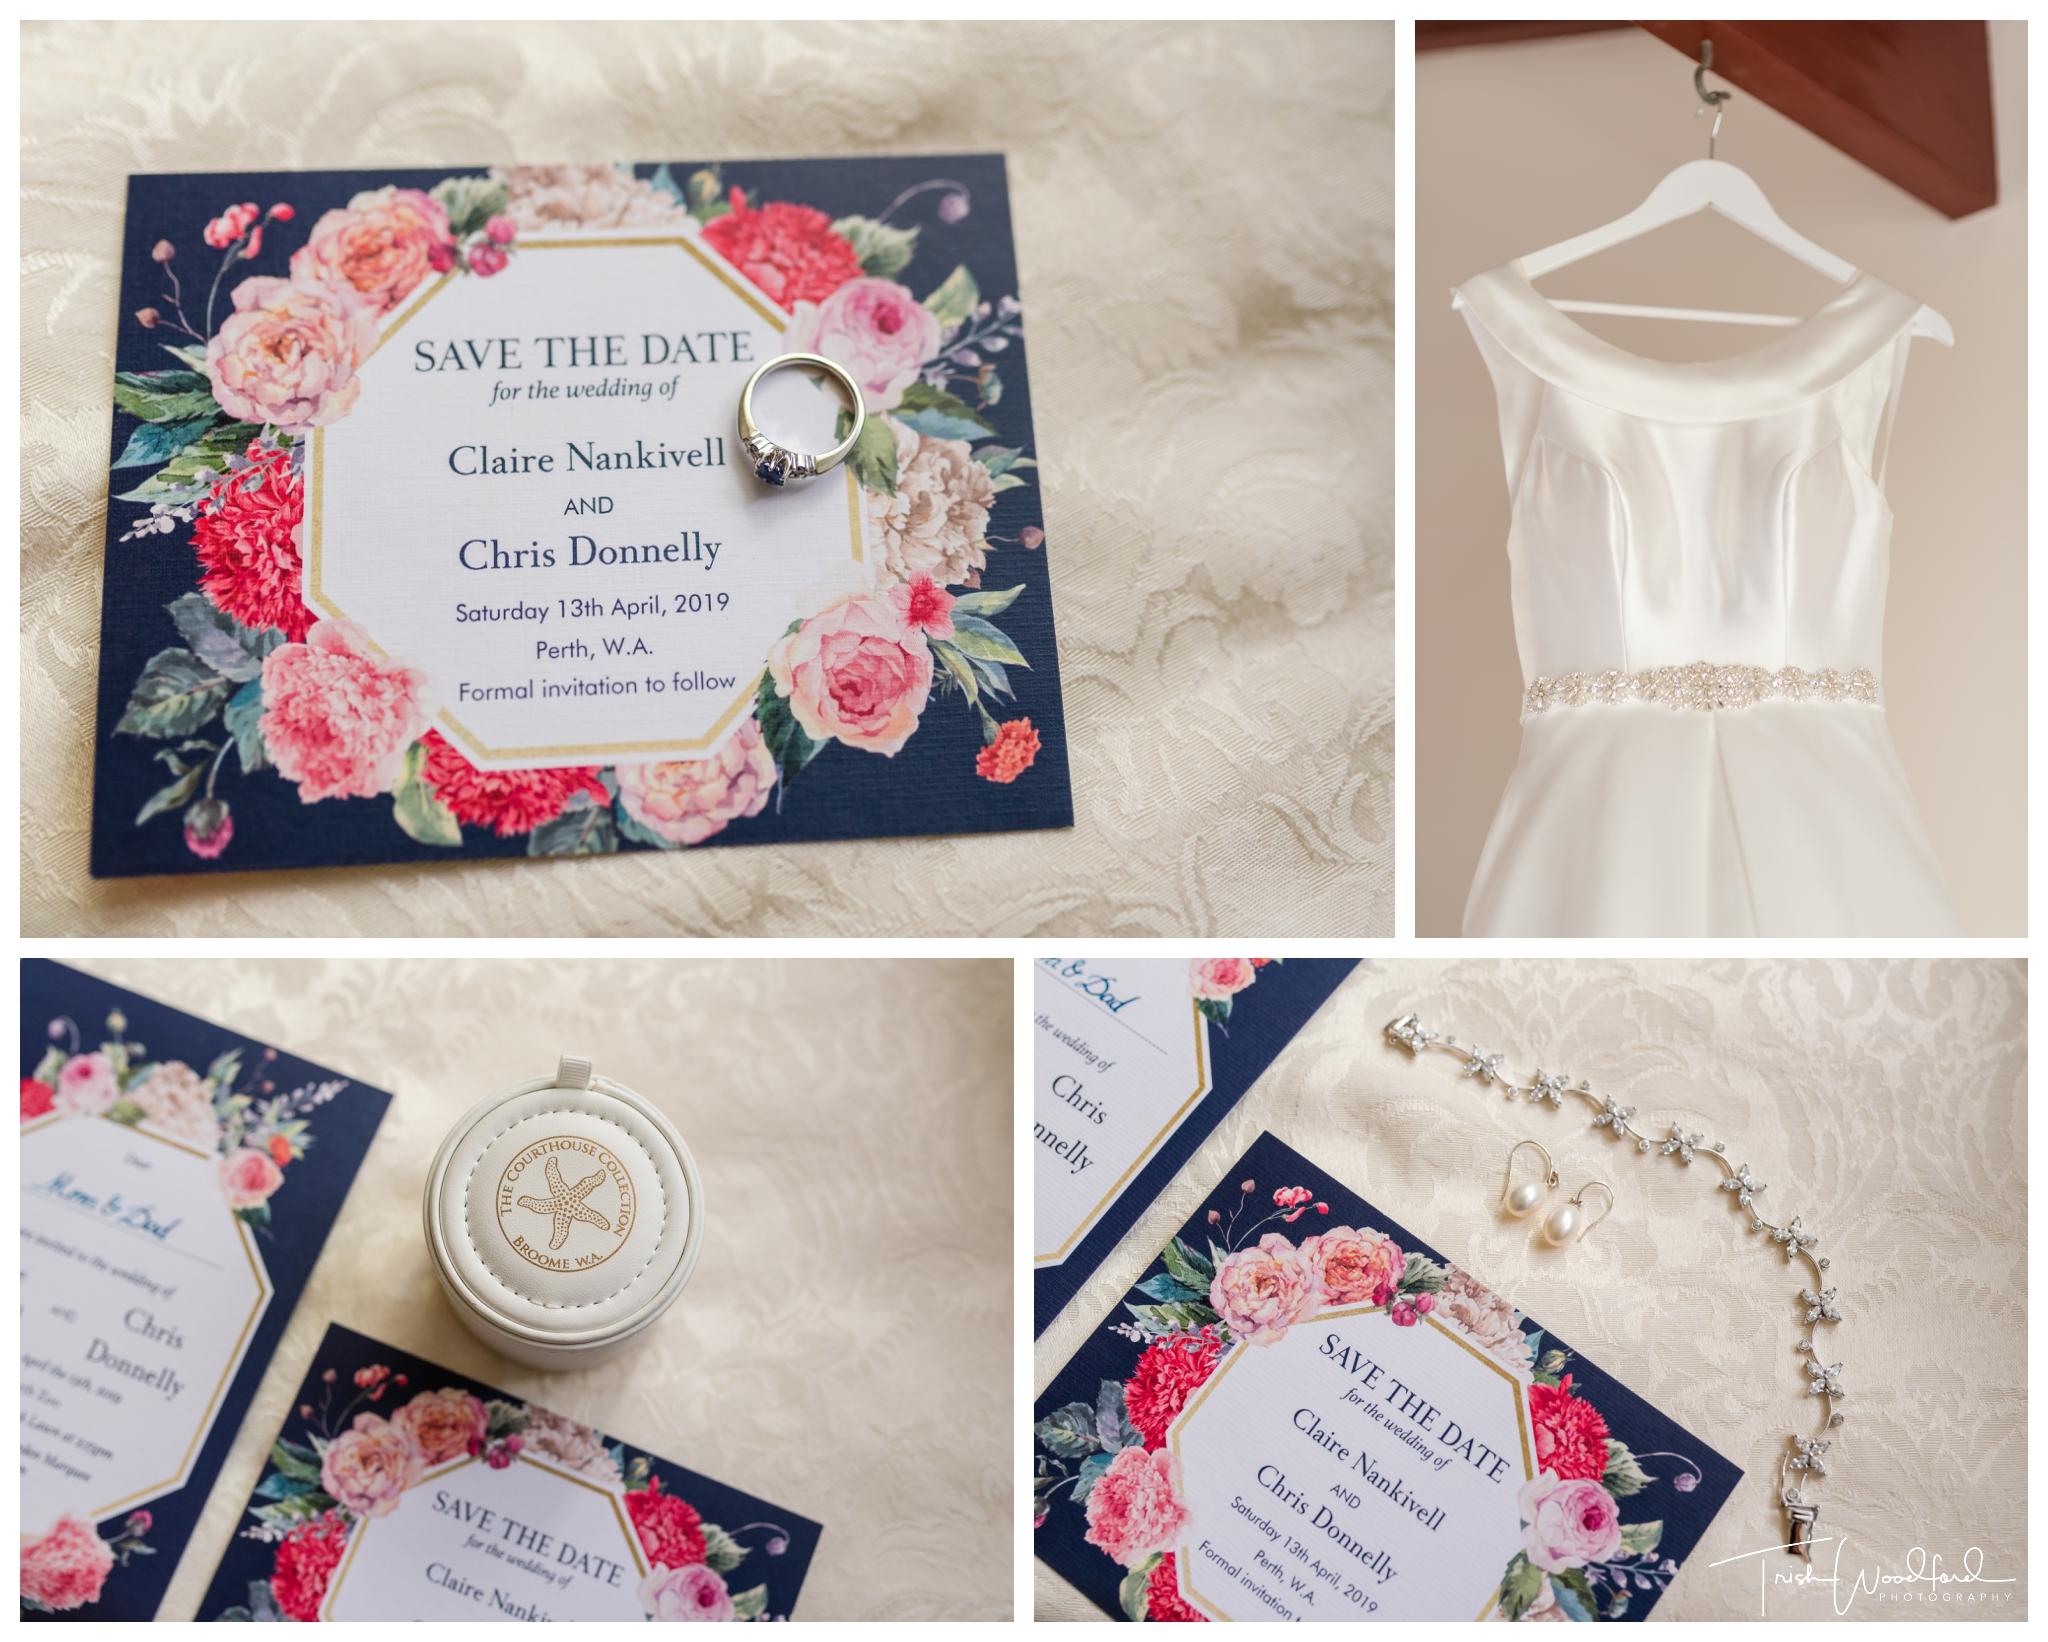 perth-wedding-details